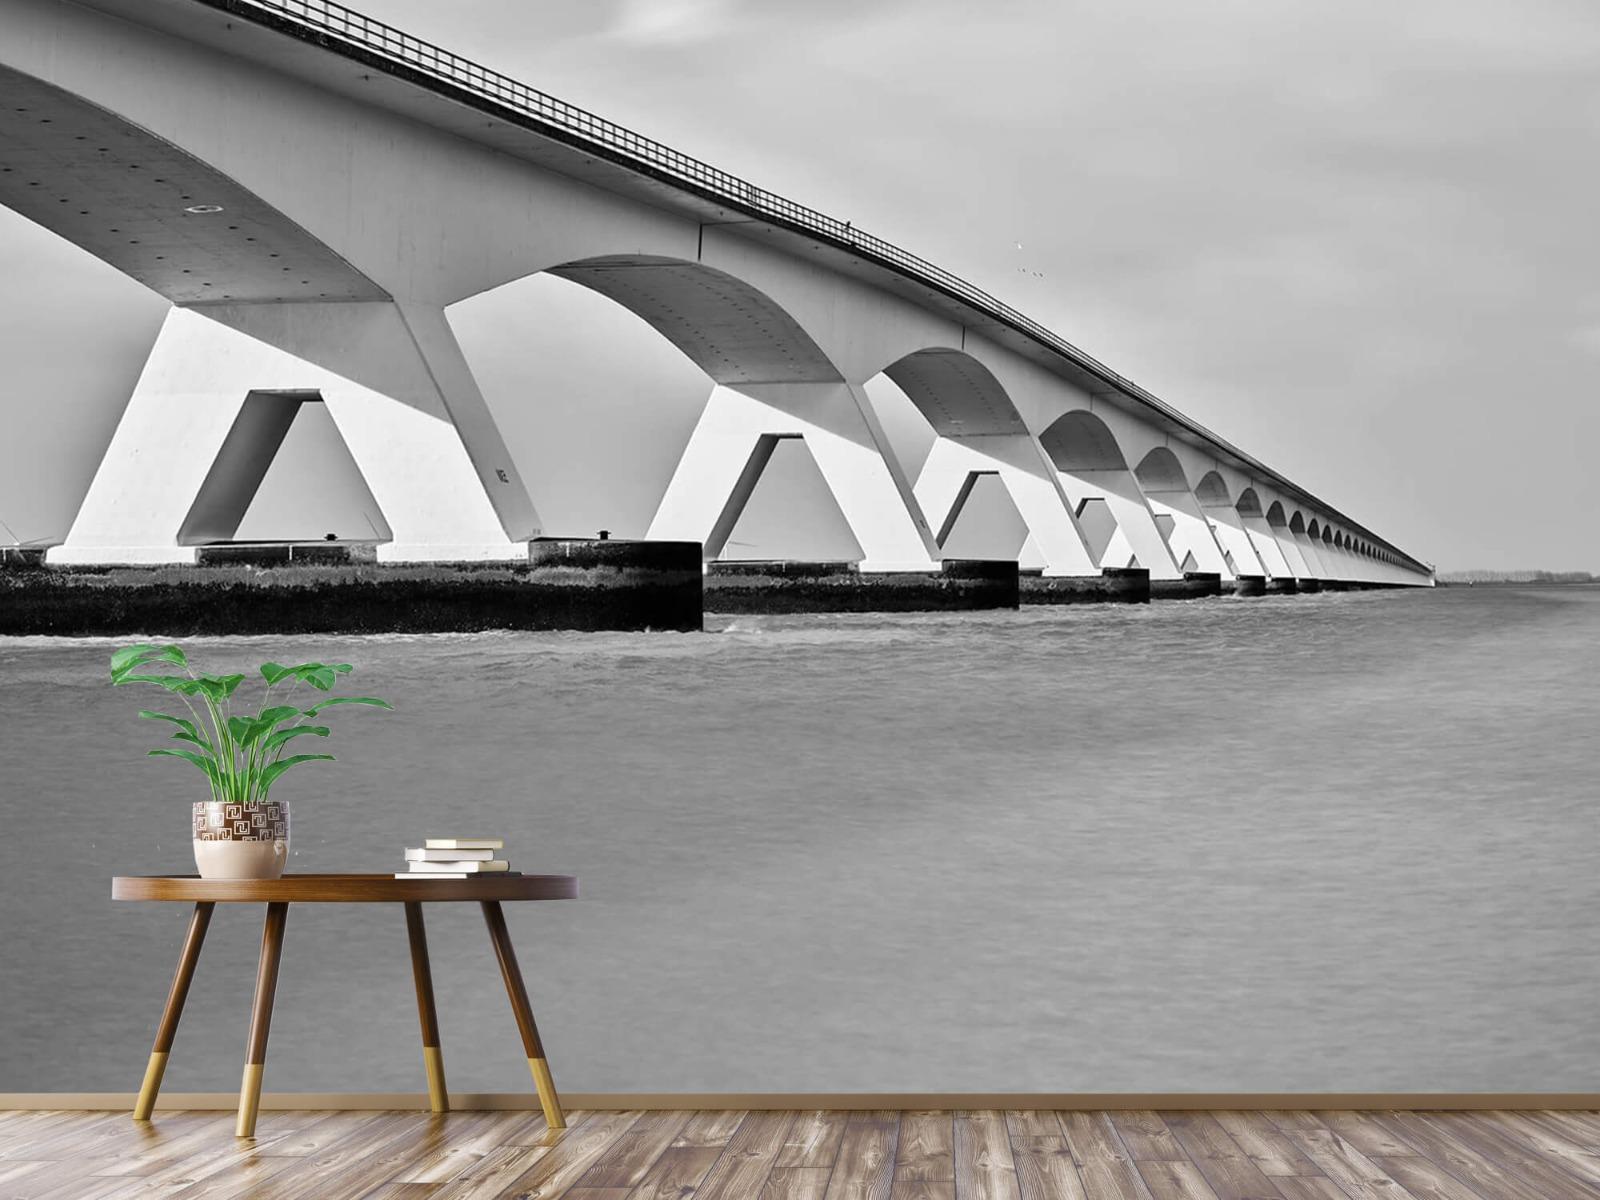 Zwart Wit behang - Lange brug - Kantoor 4